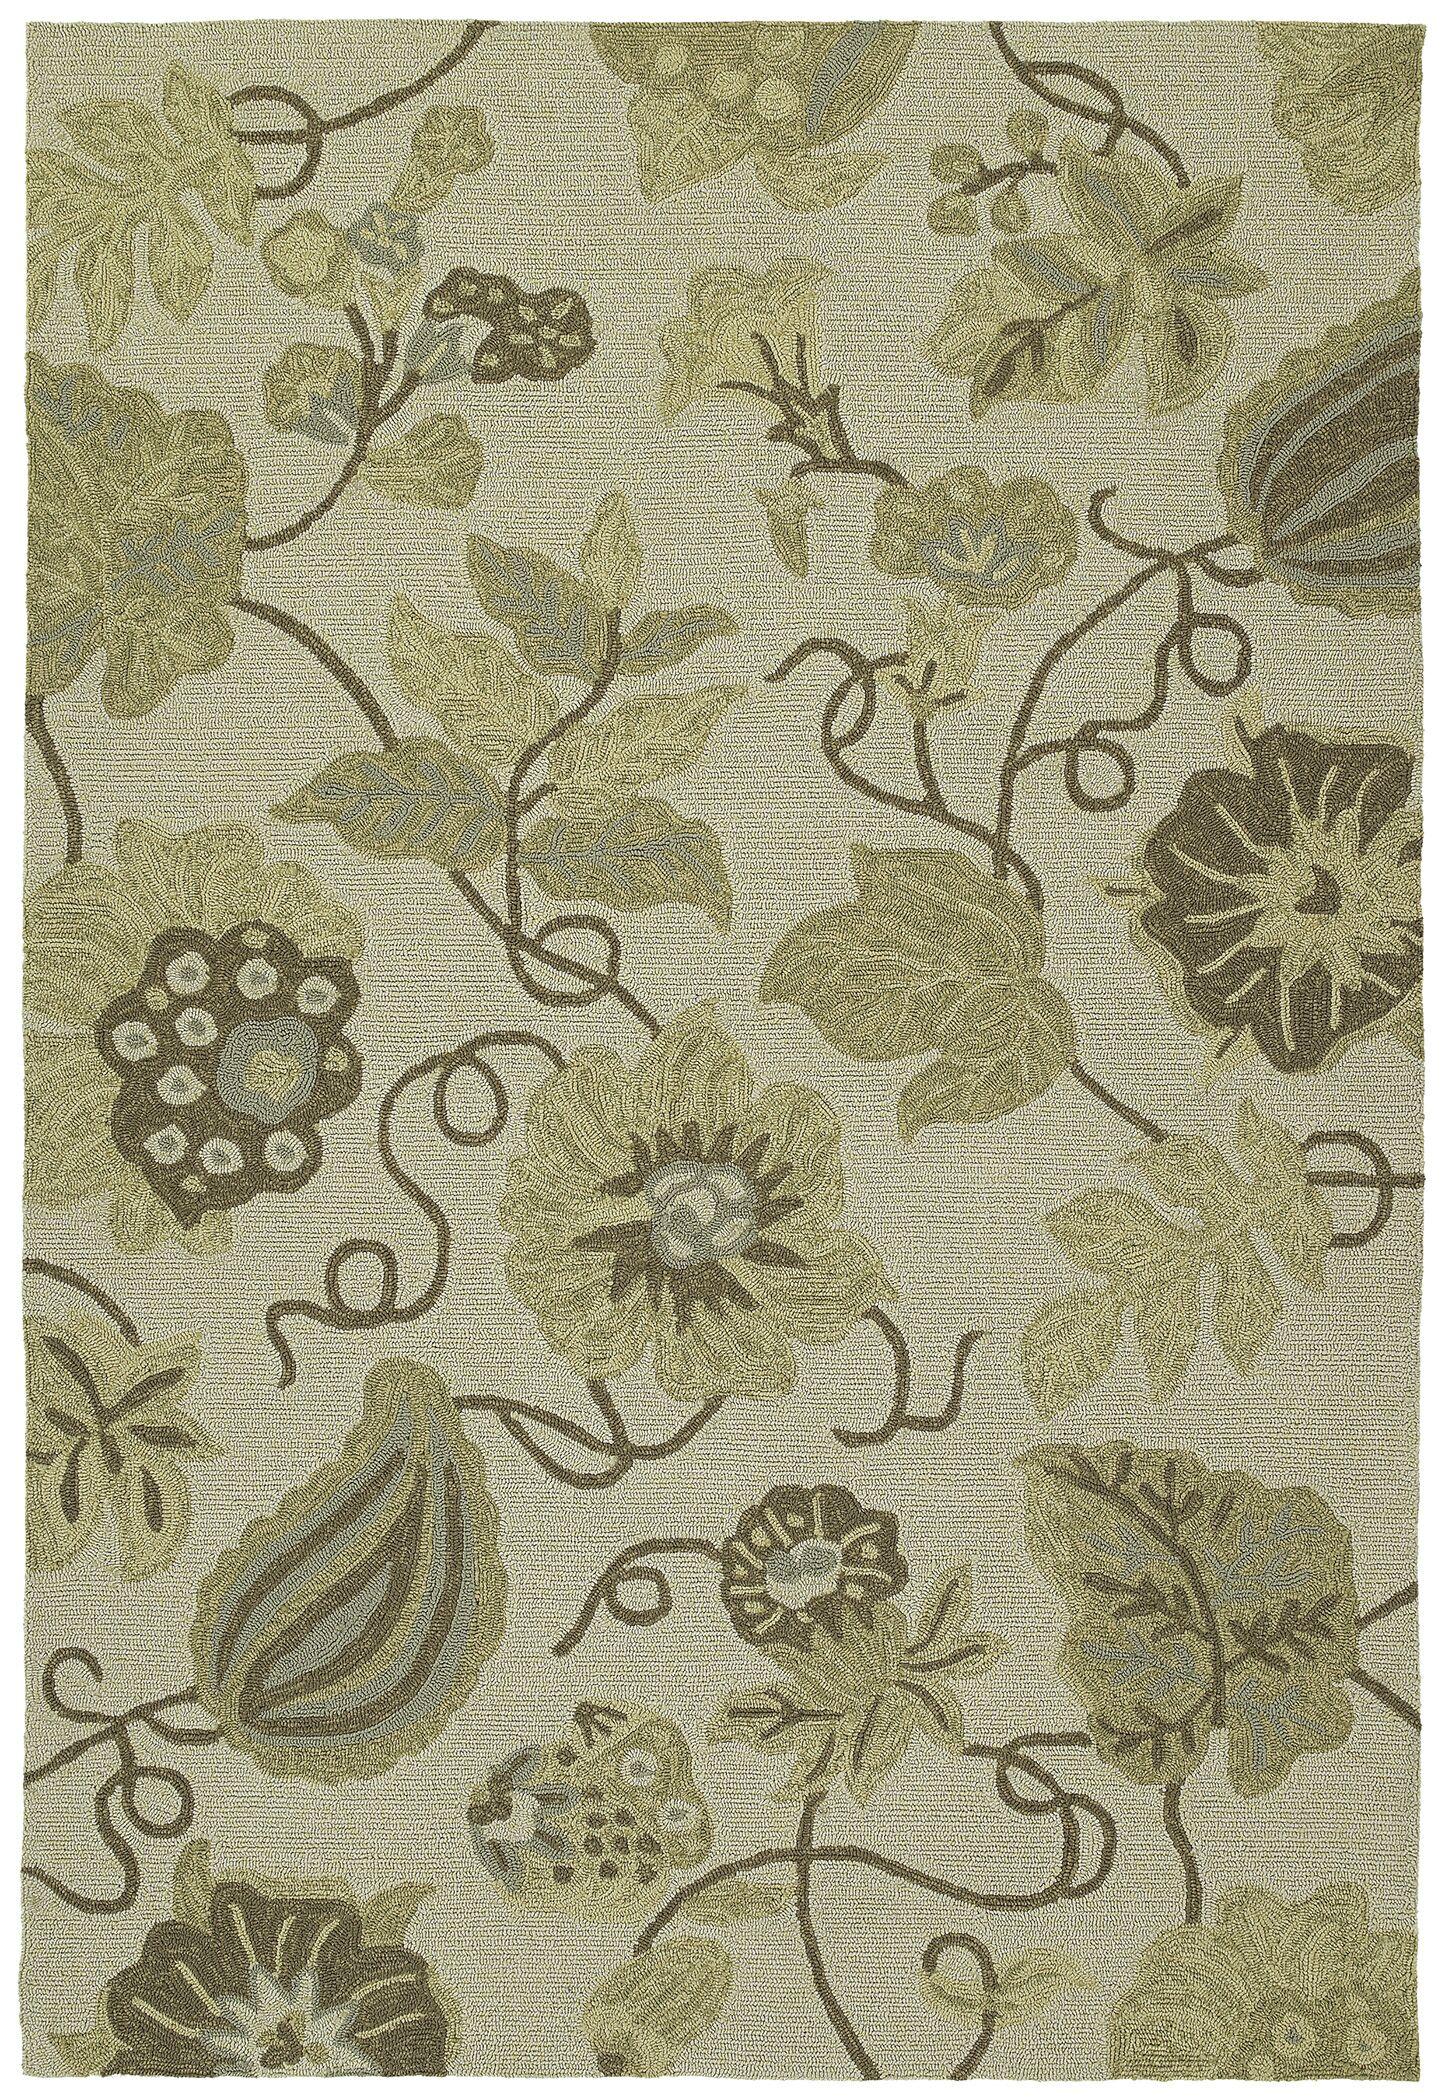 Glenn Garden Harbour Linen Floral Indoor/Outdoor Area Rug Rug Size: Square 5'9